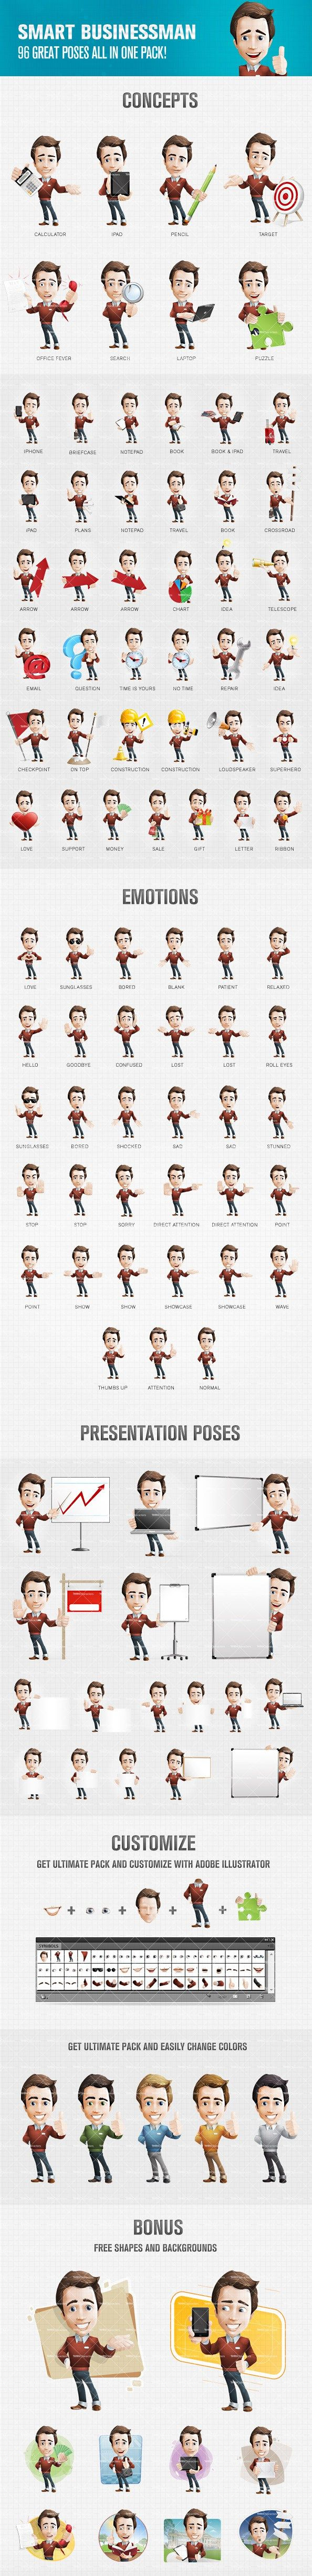 Cartoonsmart Character Design : Best business characters images on pinterest